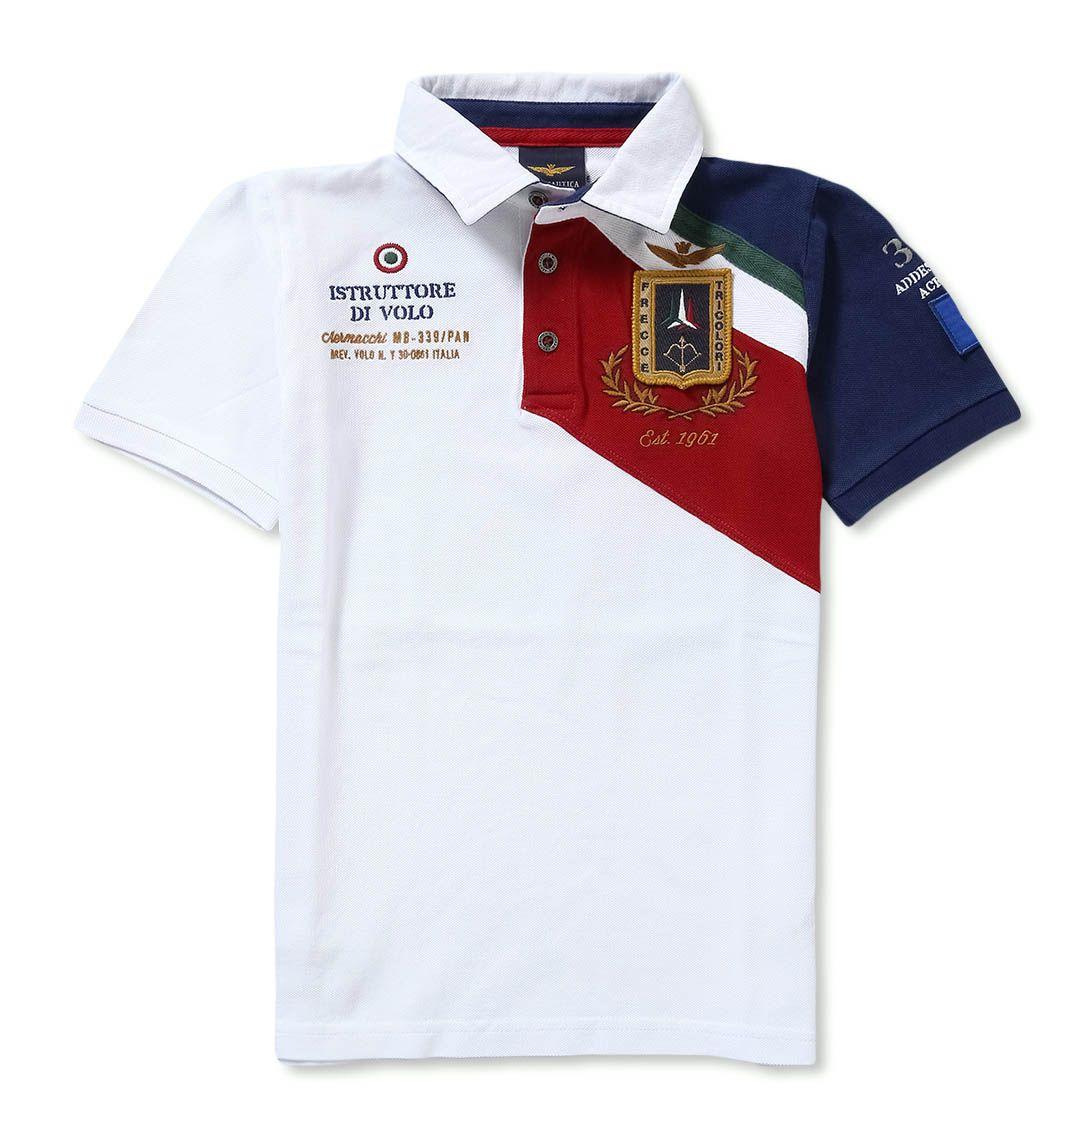 Ralph Lauren Polo Shirts For Men Outlet